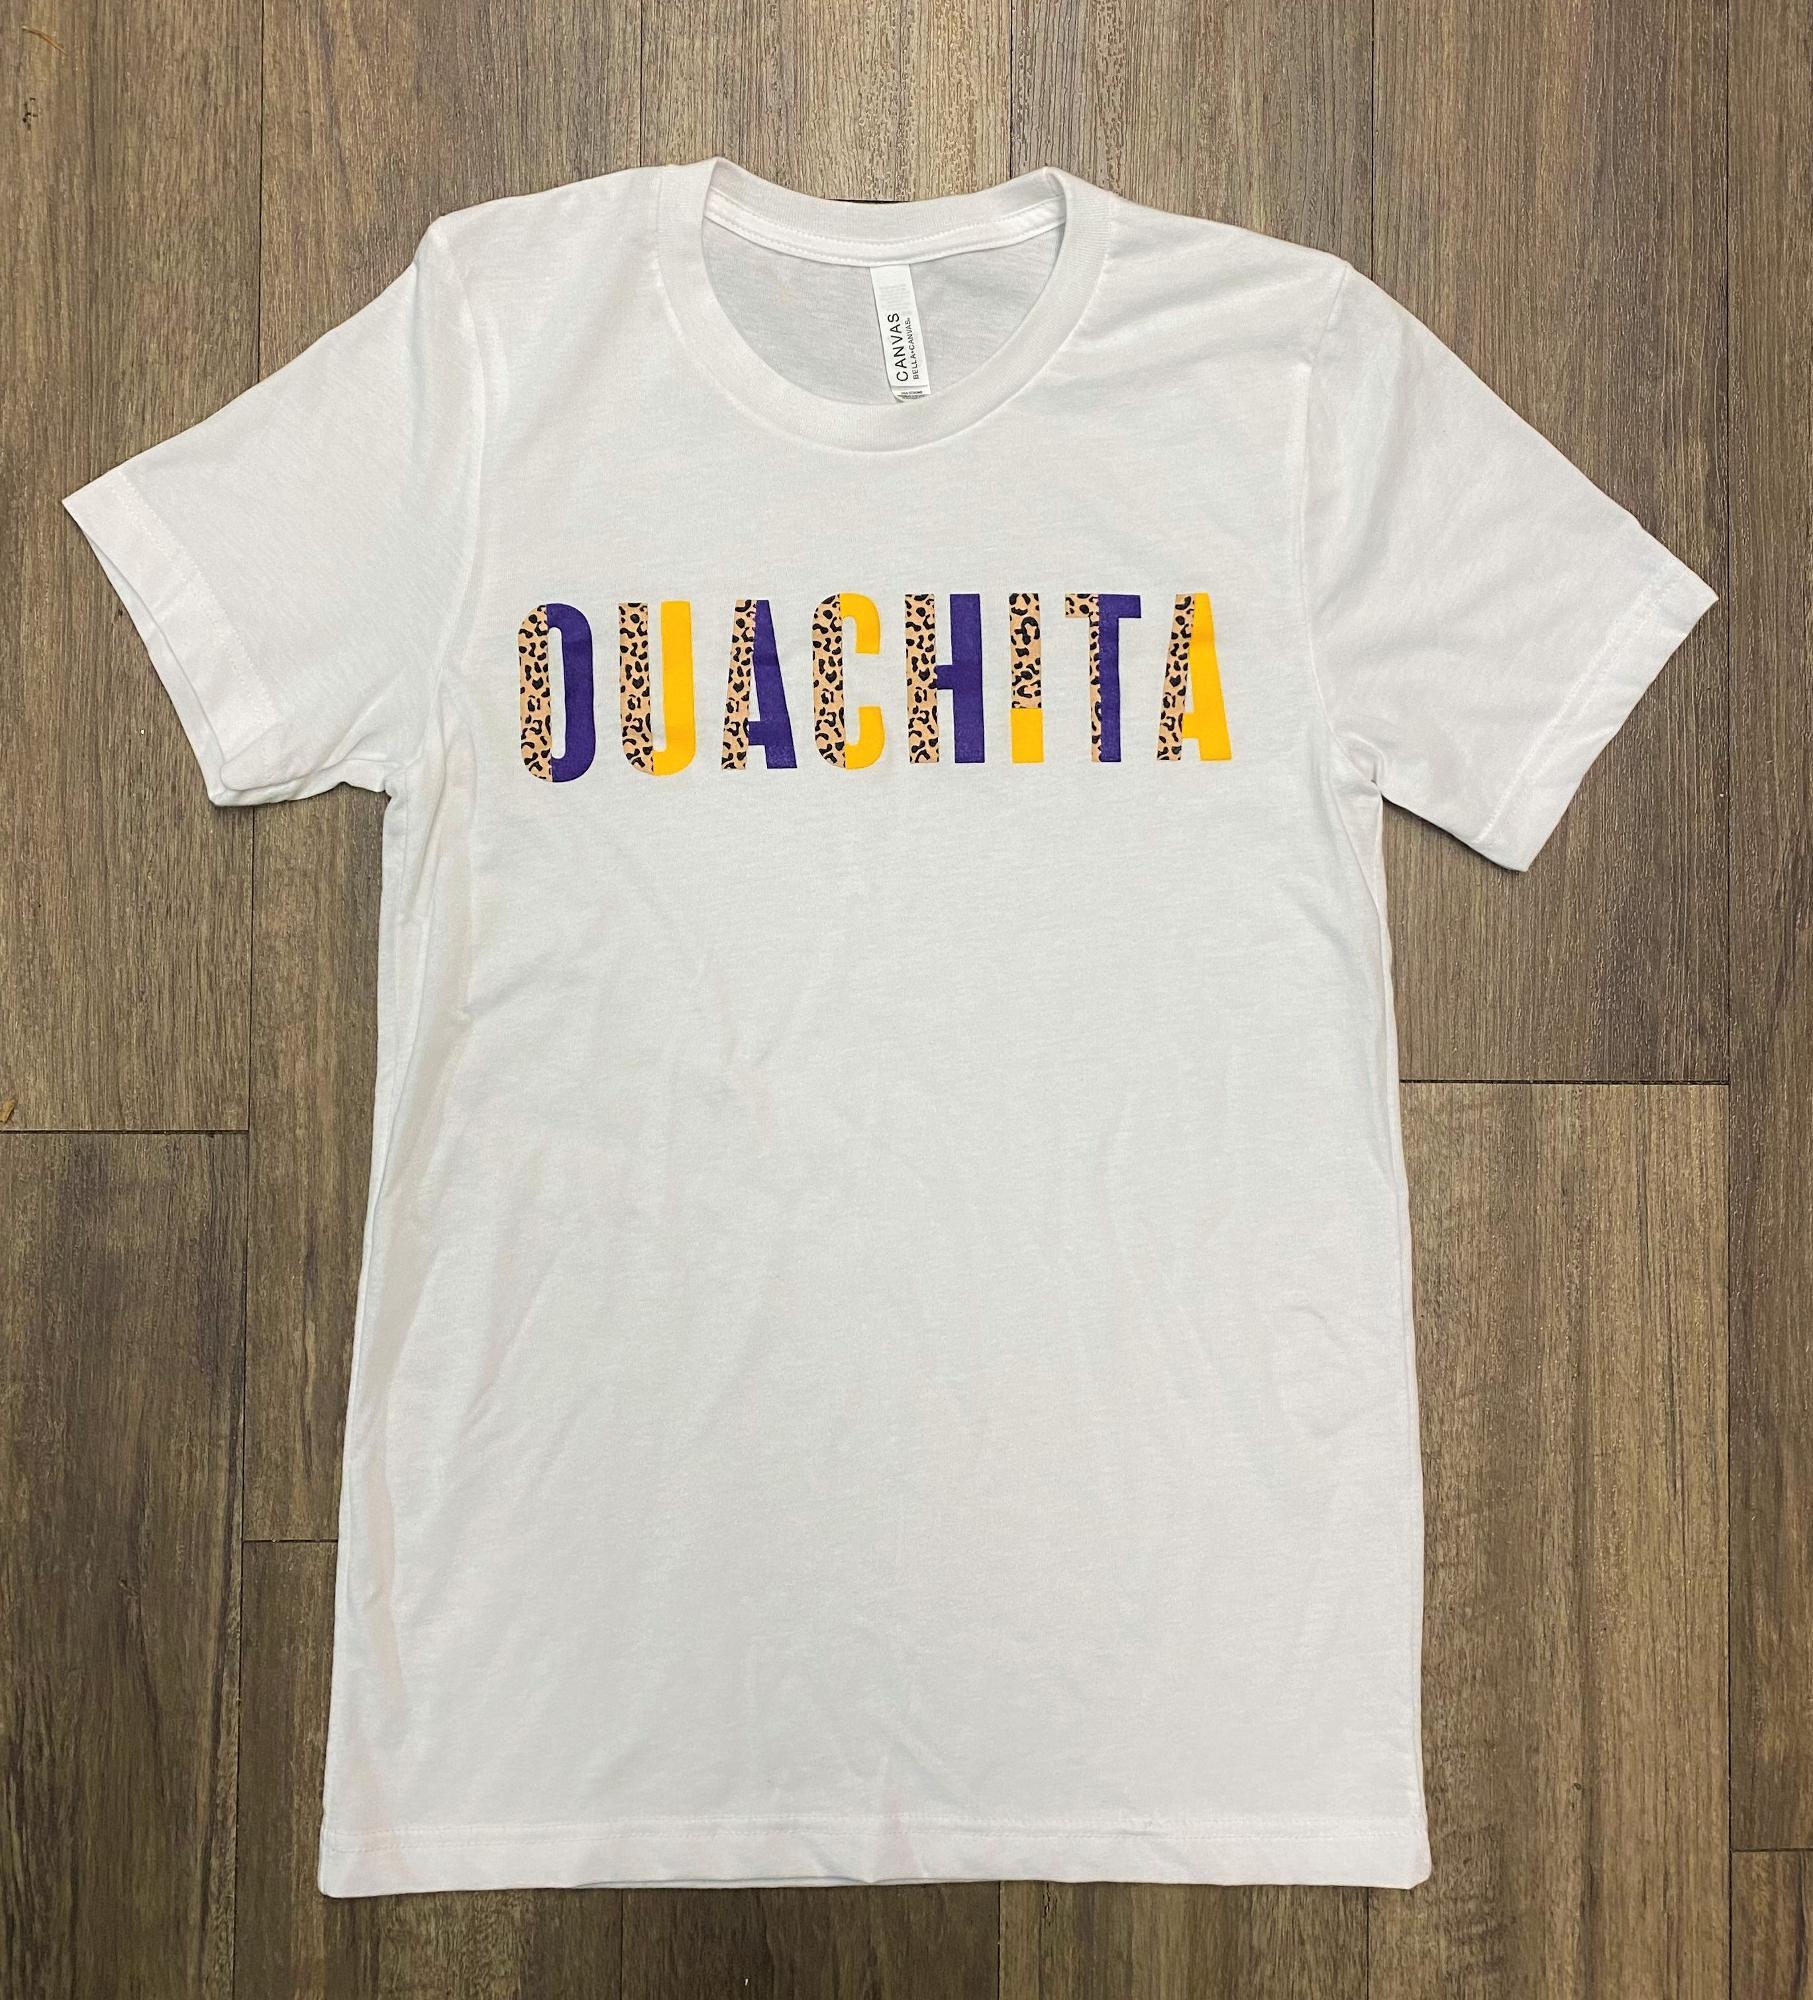 image of: OUACHITA CHEETAH BLOCK SHORT SLEEVE T-SHIRT